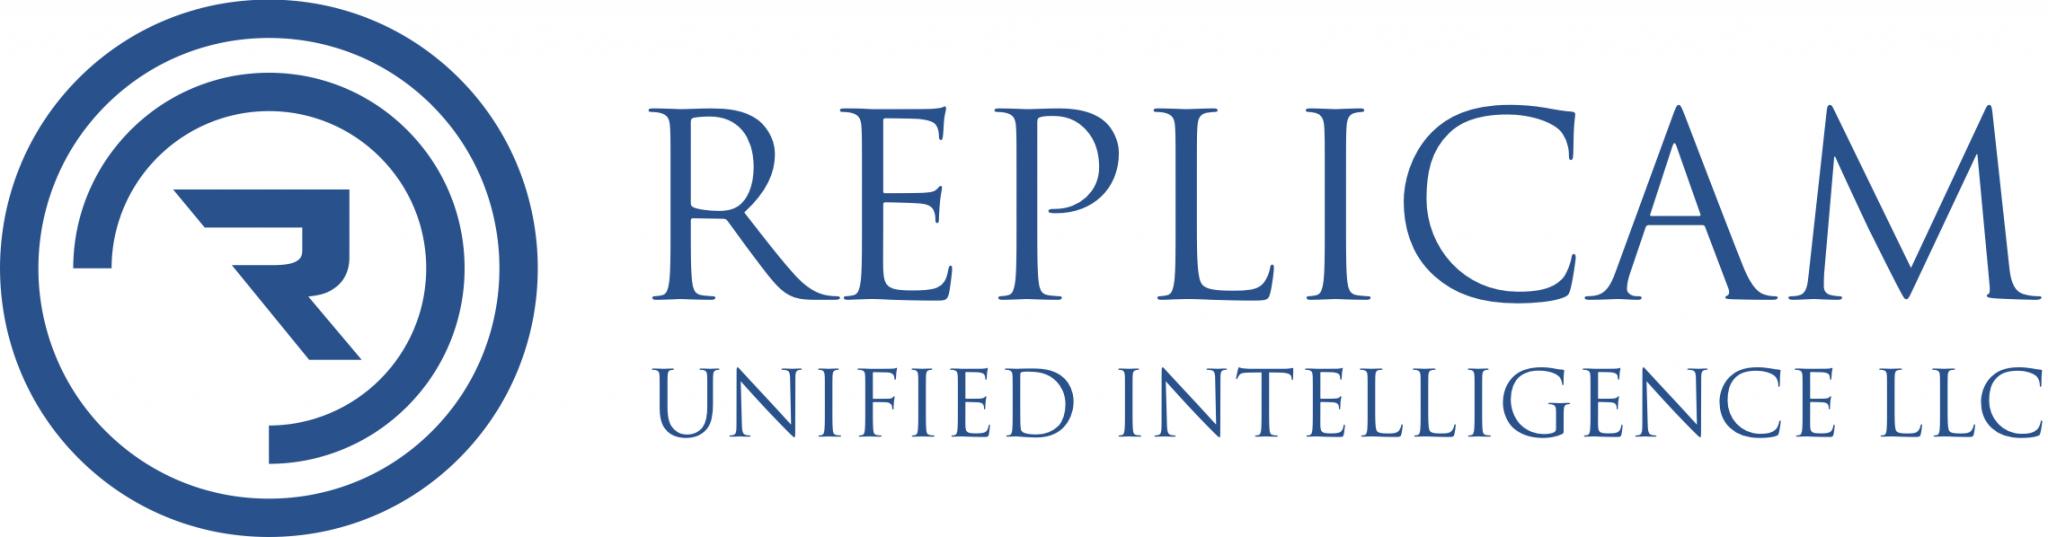 replicam_flat_v2